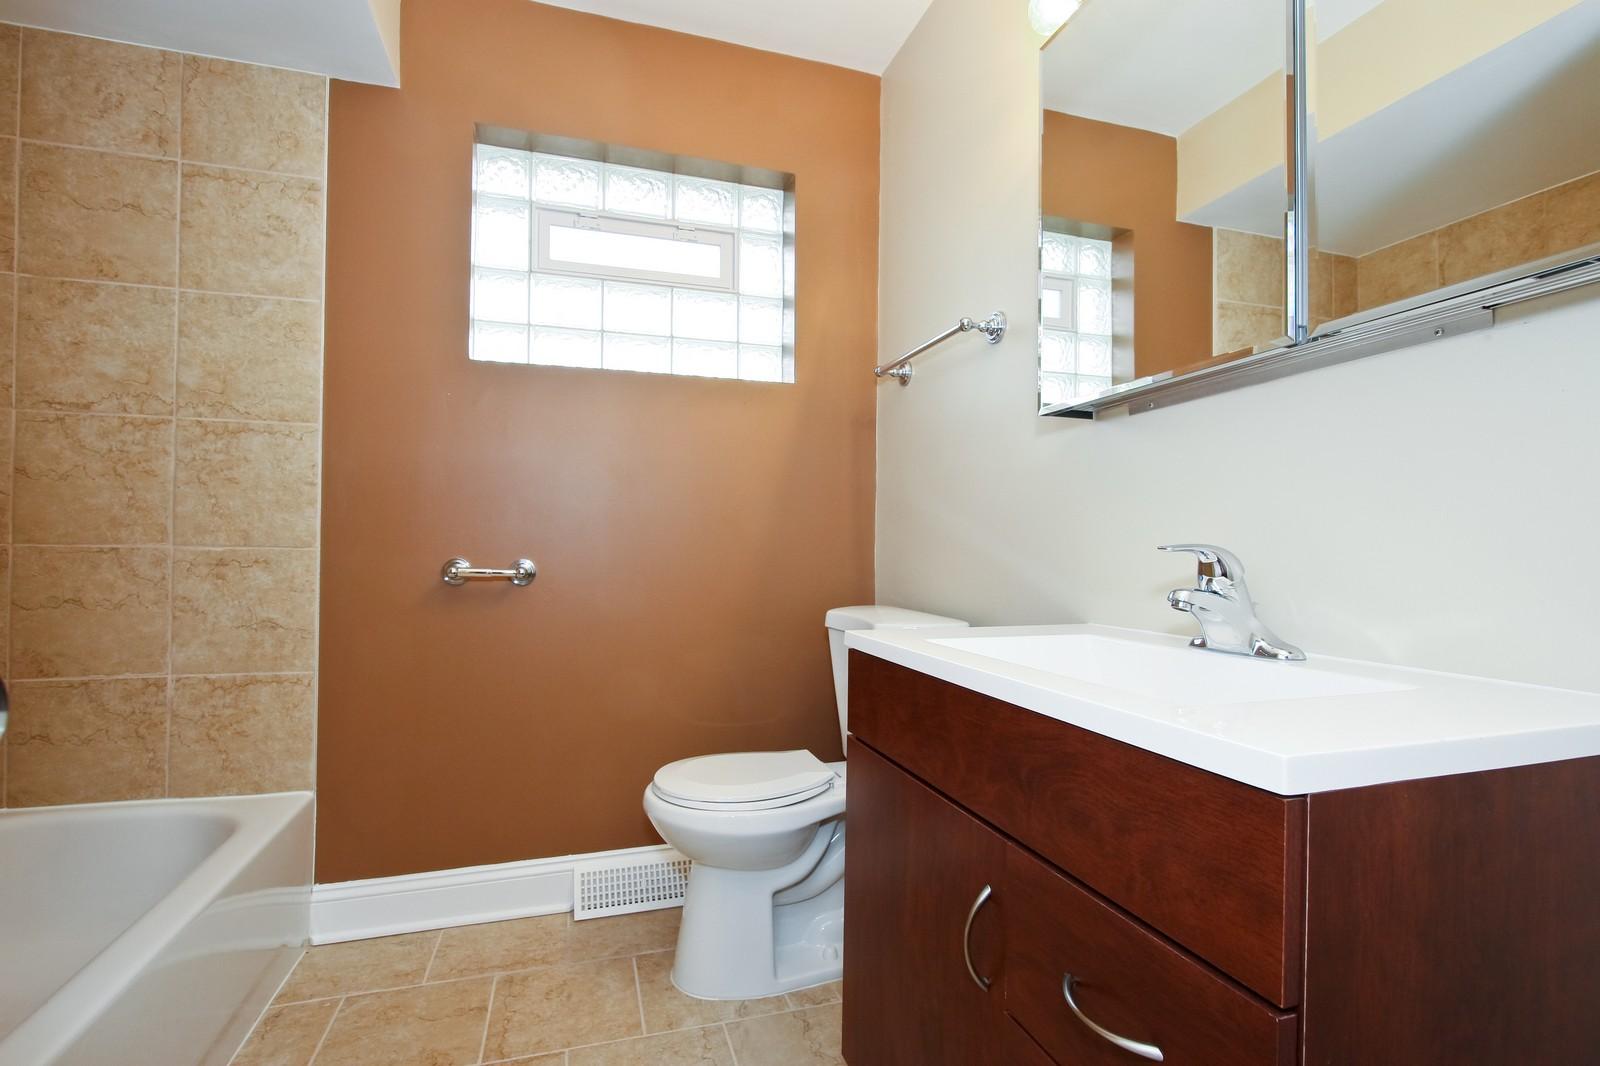 Real Estate Photography - 1025 E 156th St, Dolton, IL, 60419 - Bathroom